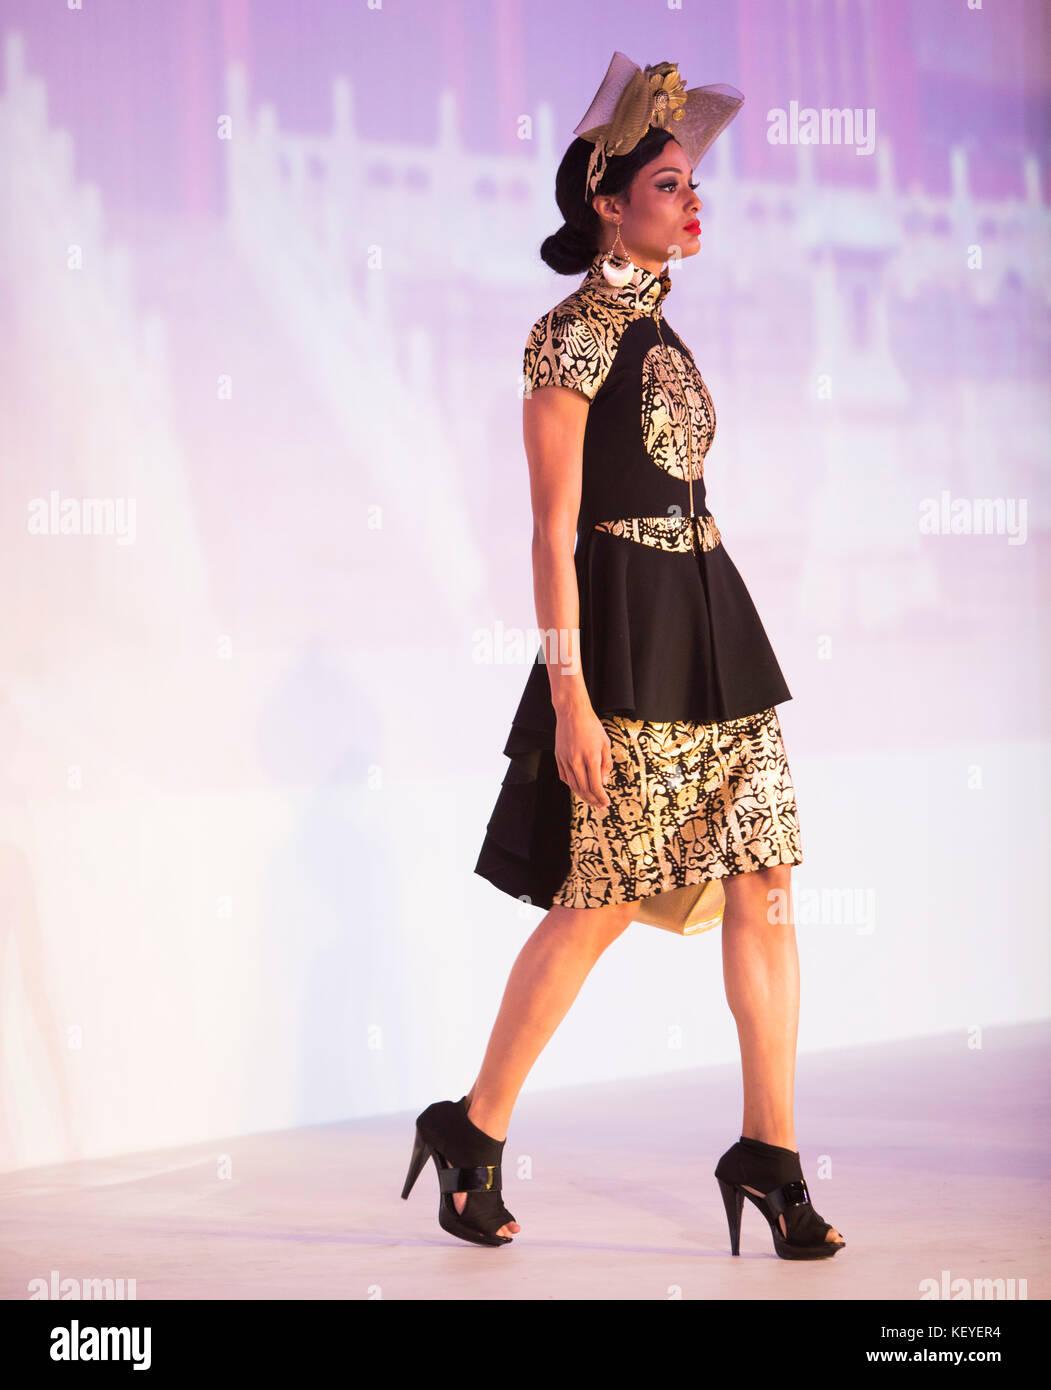 Model On Runwaywearing Design By David Tupaz Style Fashion Week Stock Photo Alamy